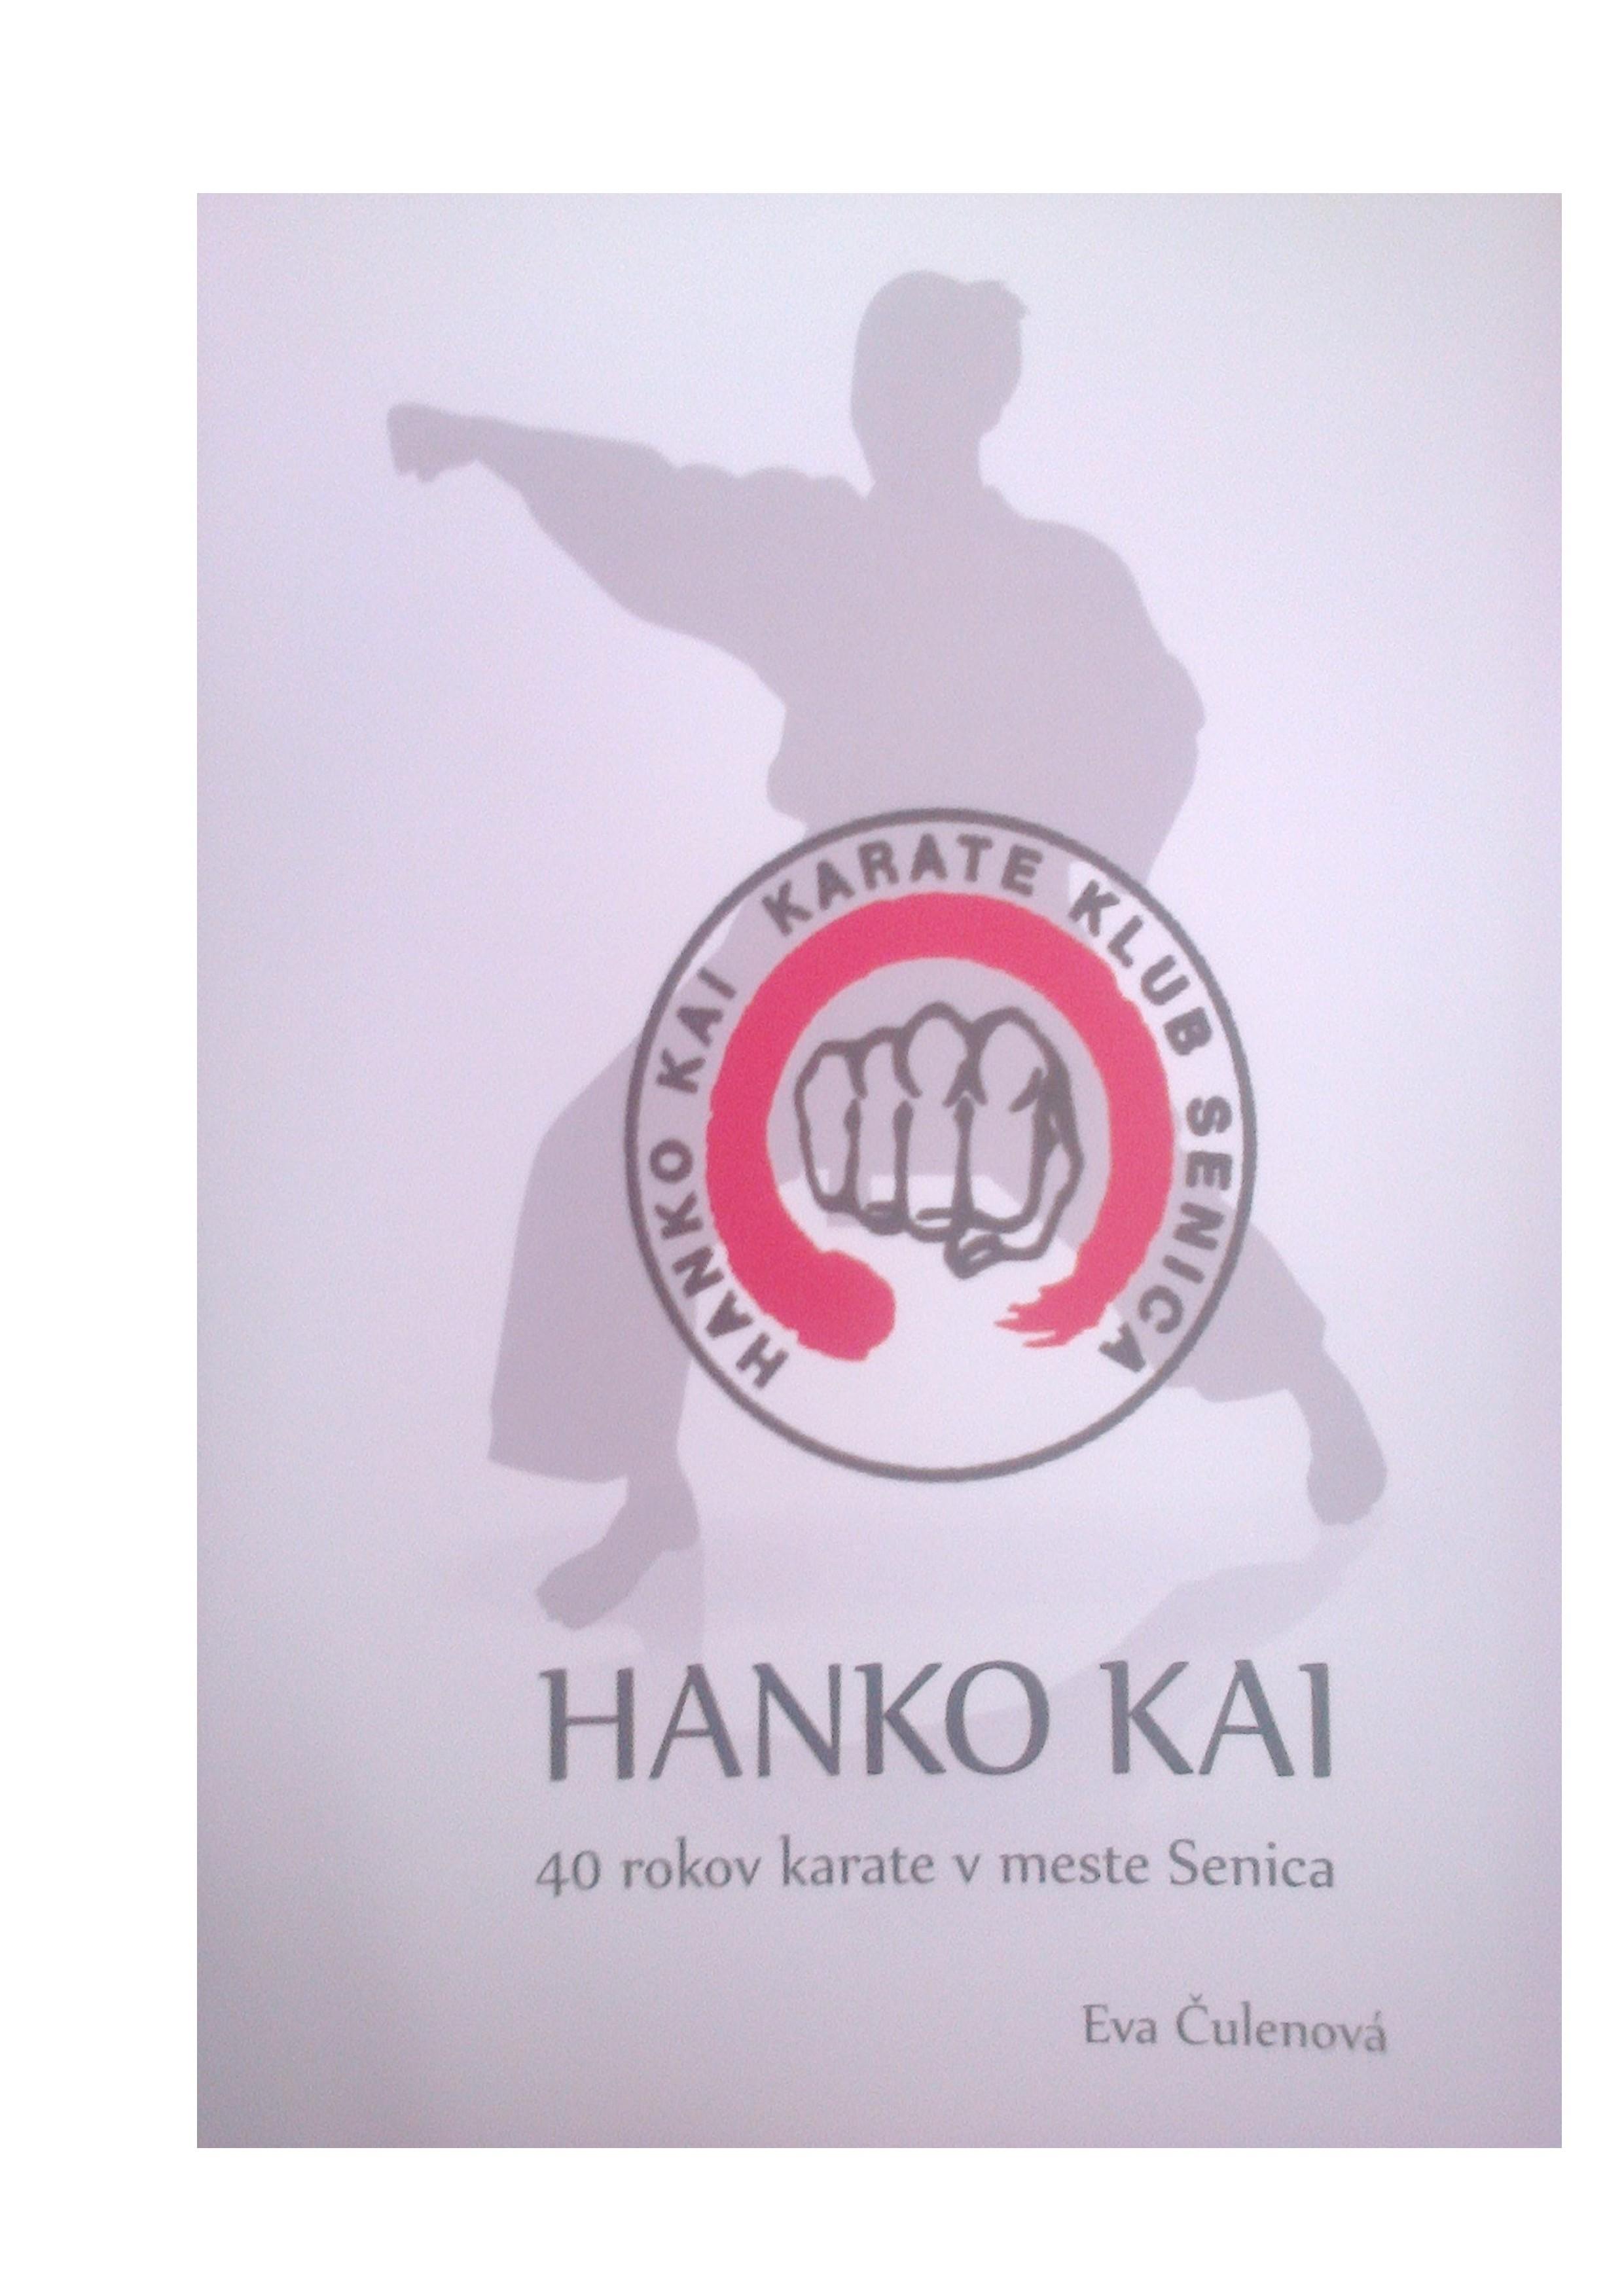 HANKO KAI. 40 rokov karate v meste Senica